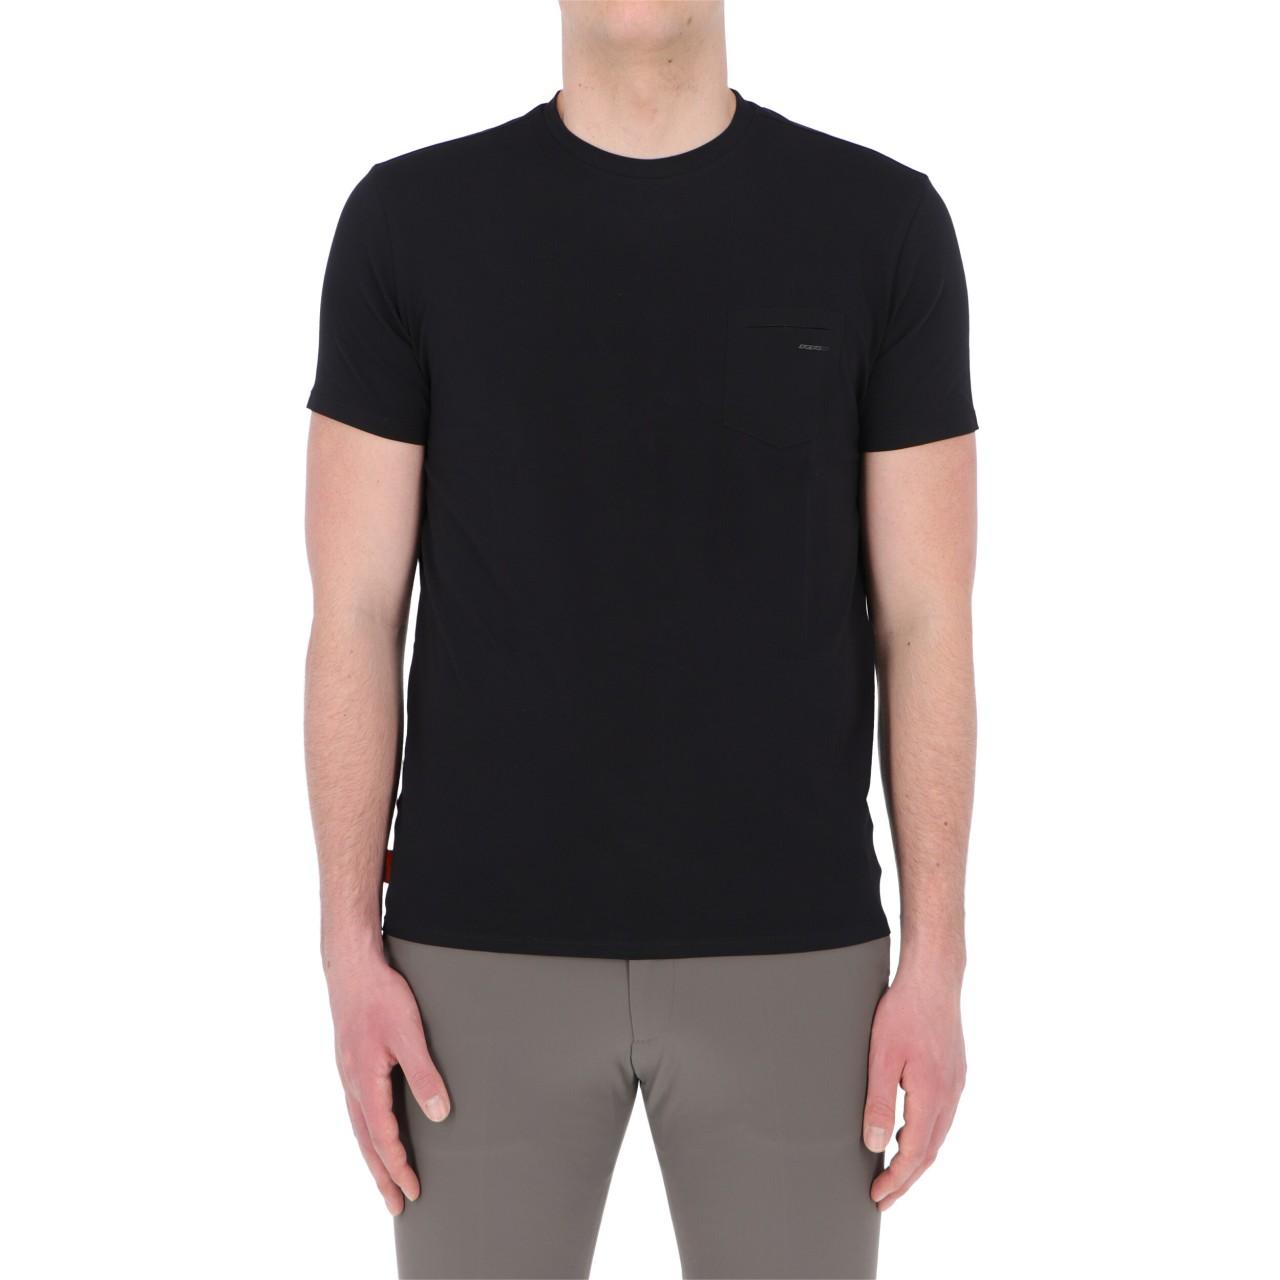 Rrd Uomo Tshirt Roberto Ricci Design Uomo Shirty Revo 21163P